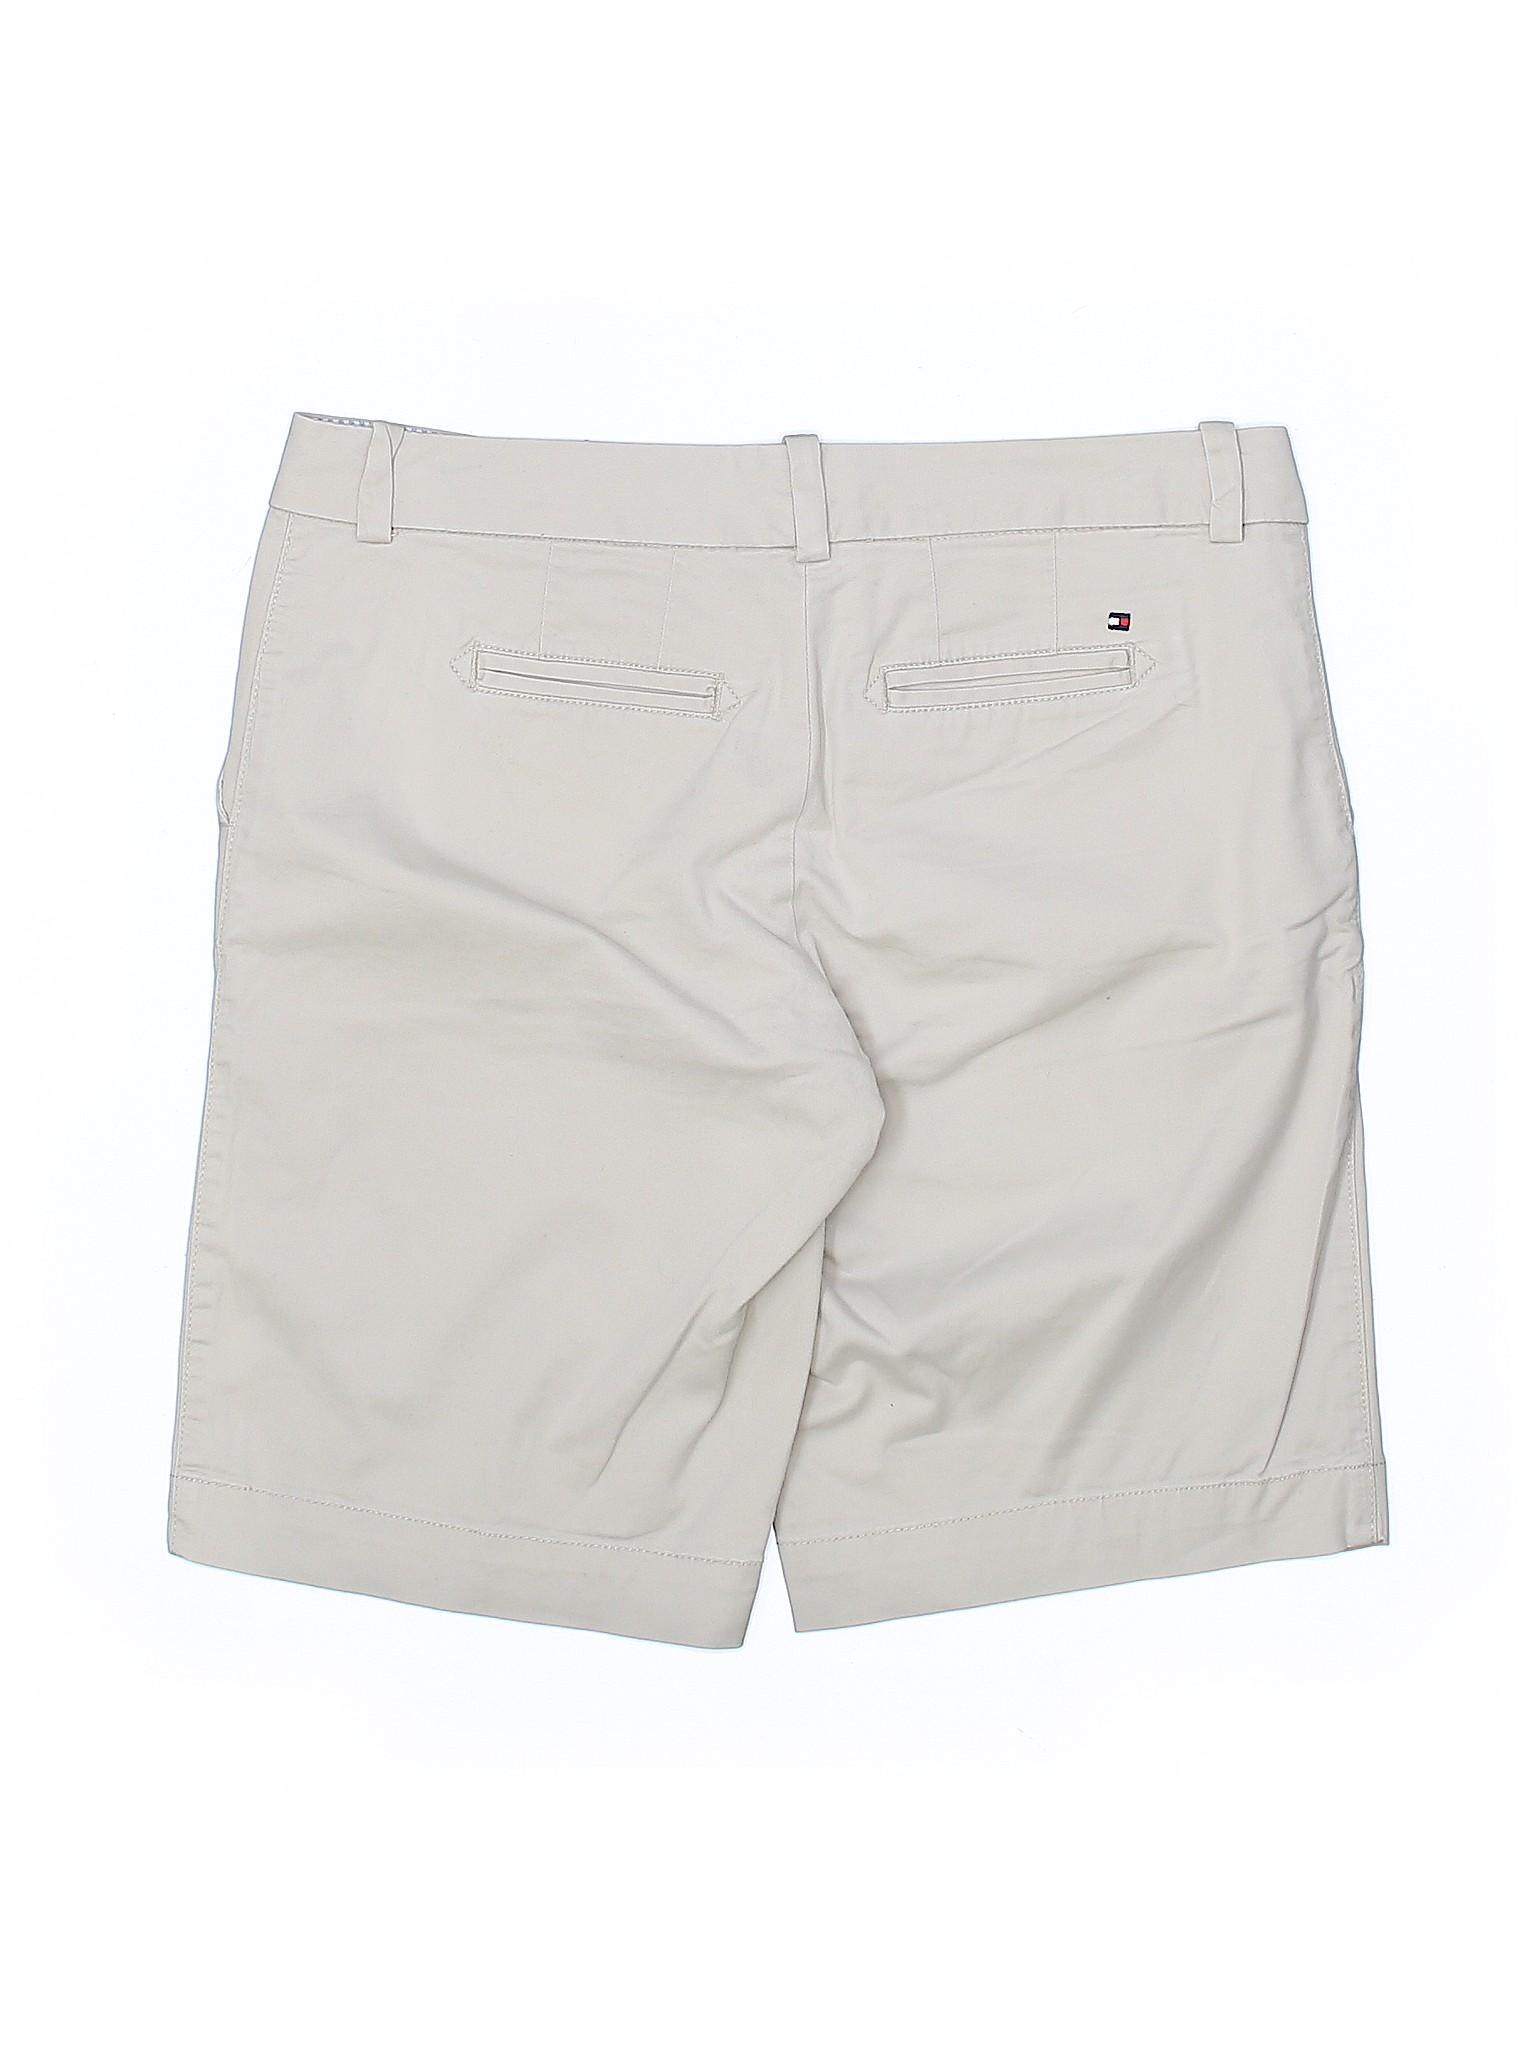 Tommy leisure Boutique Hilfiger Shorts Khaki 5Fq1w0Pv